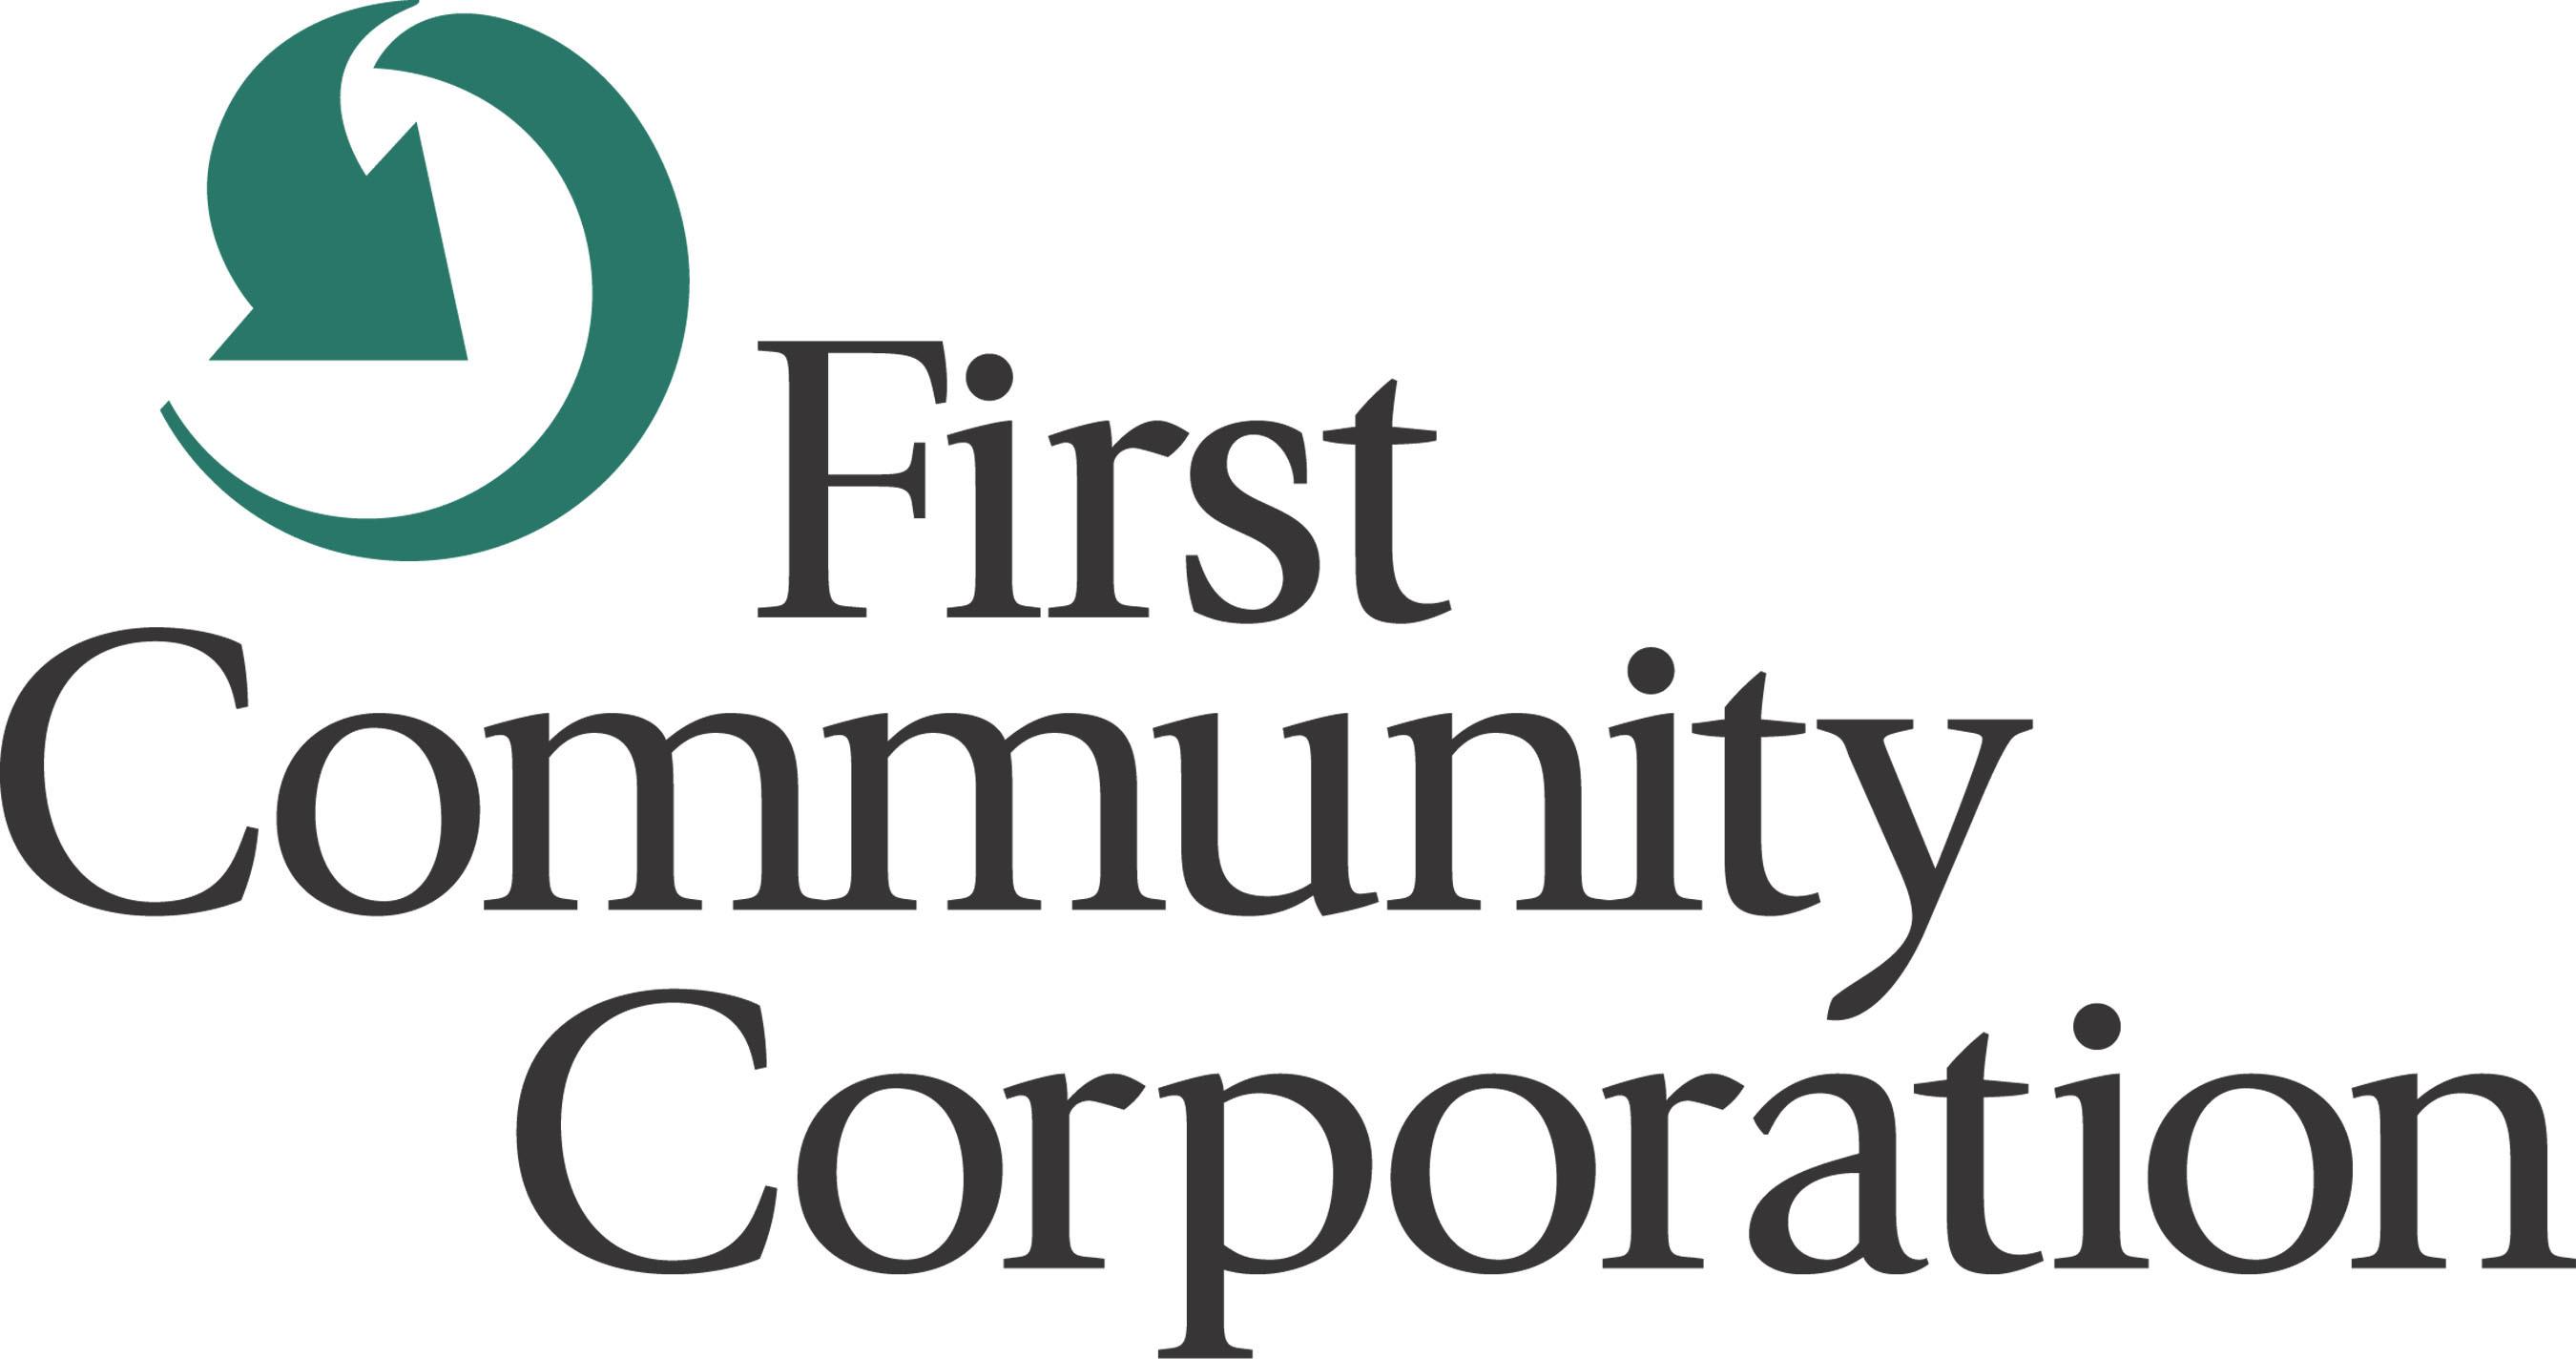 First Community Corporation logo